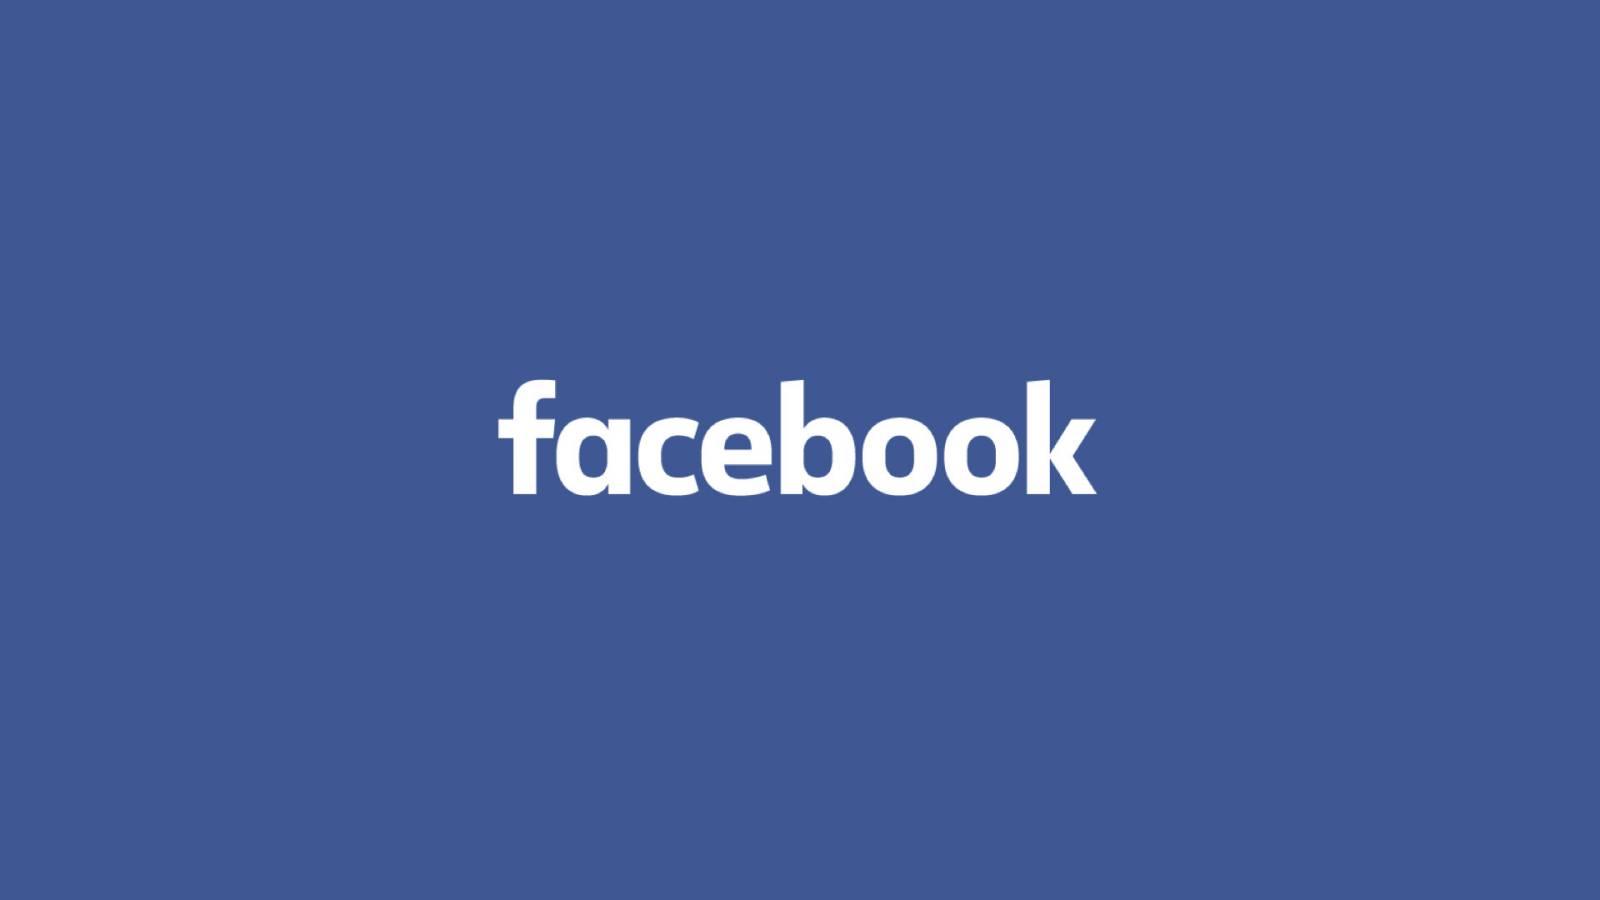 Facebook Update este Acum Disponibil pentru Instalare